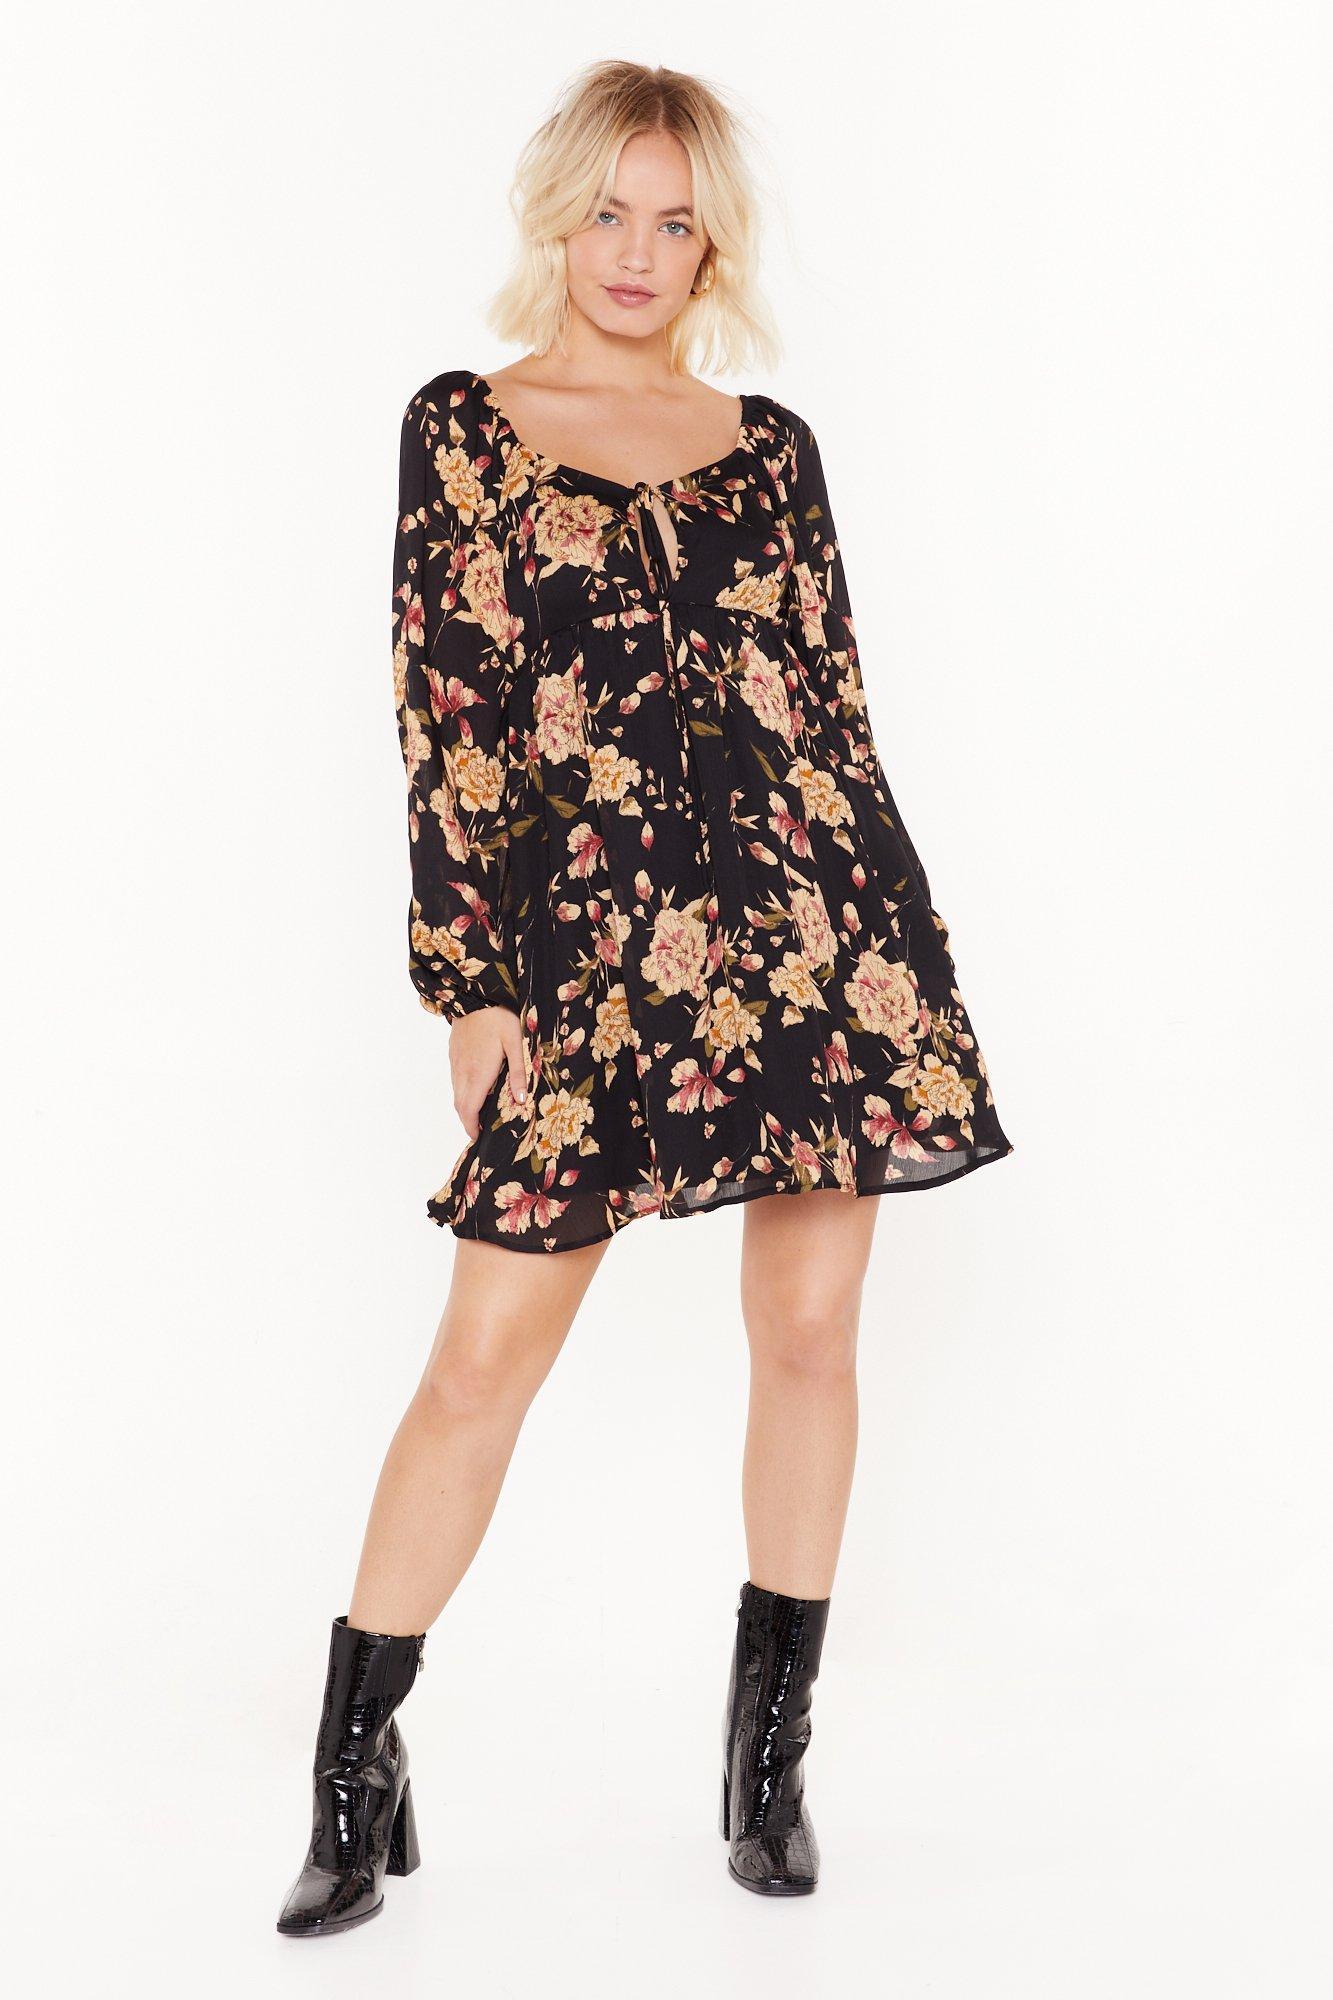 Image of Grow It Away Floral Mini Dress